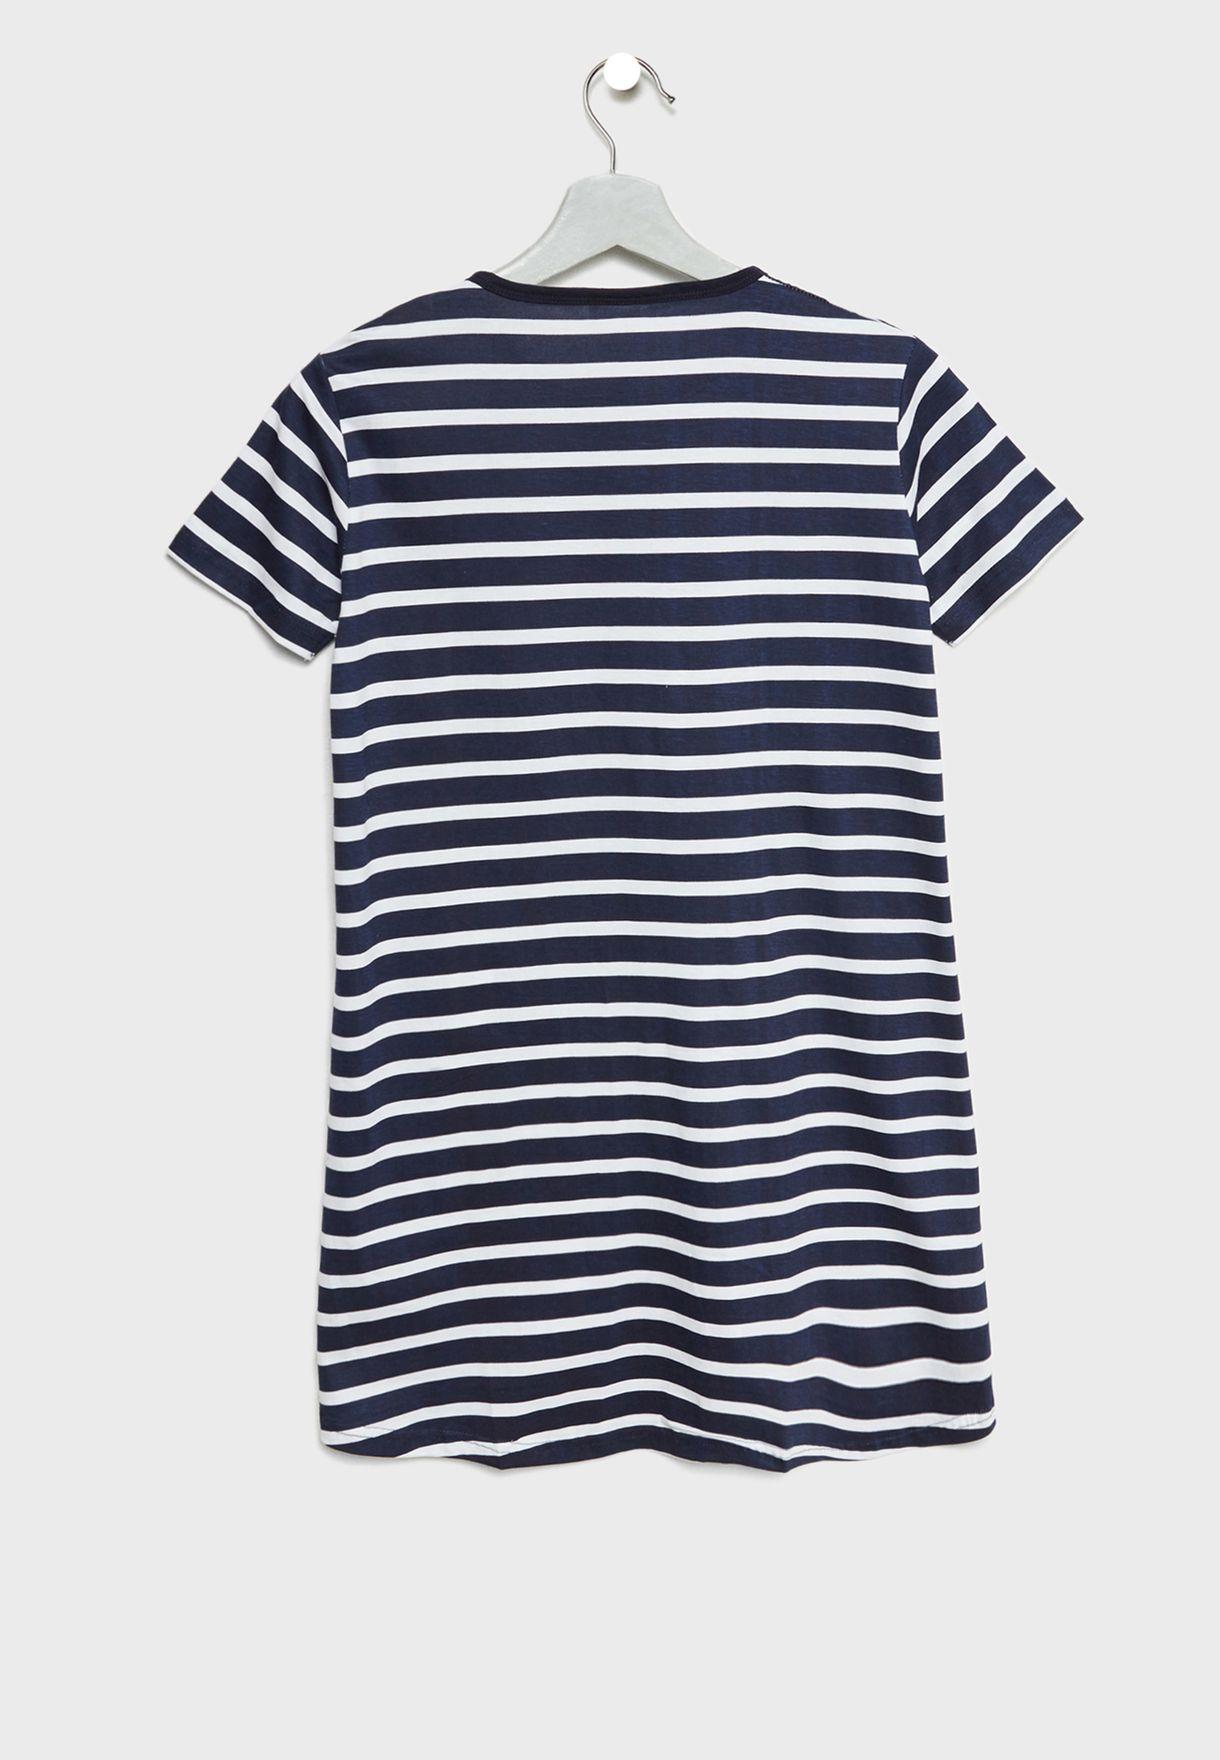 قميص نوم اطفال بخطوط